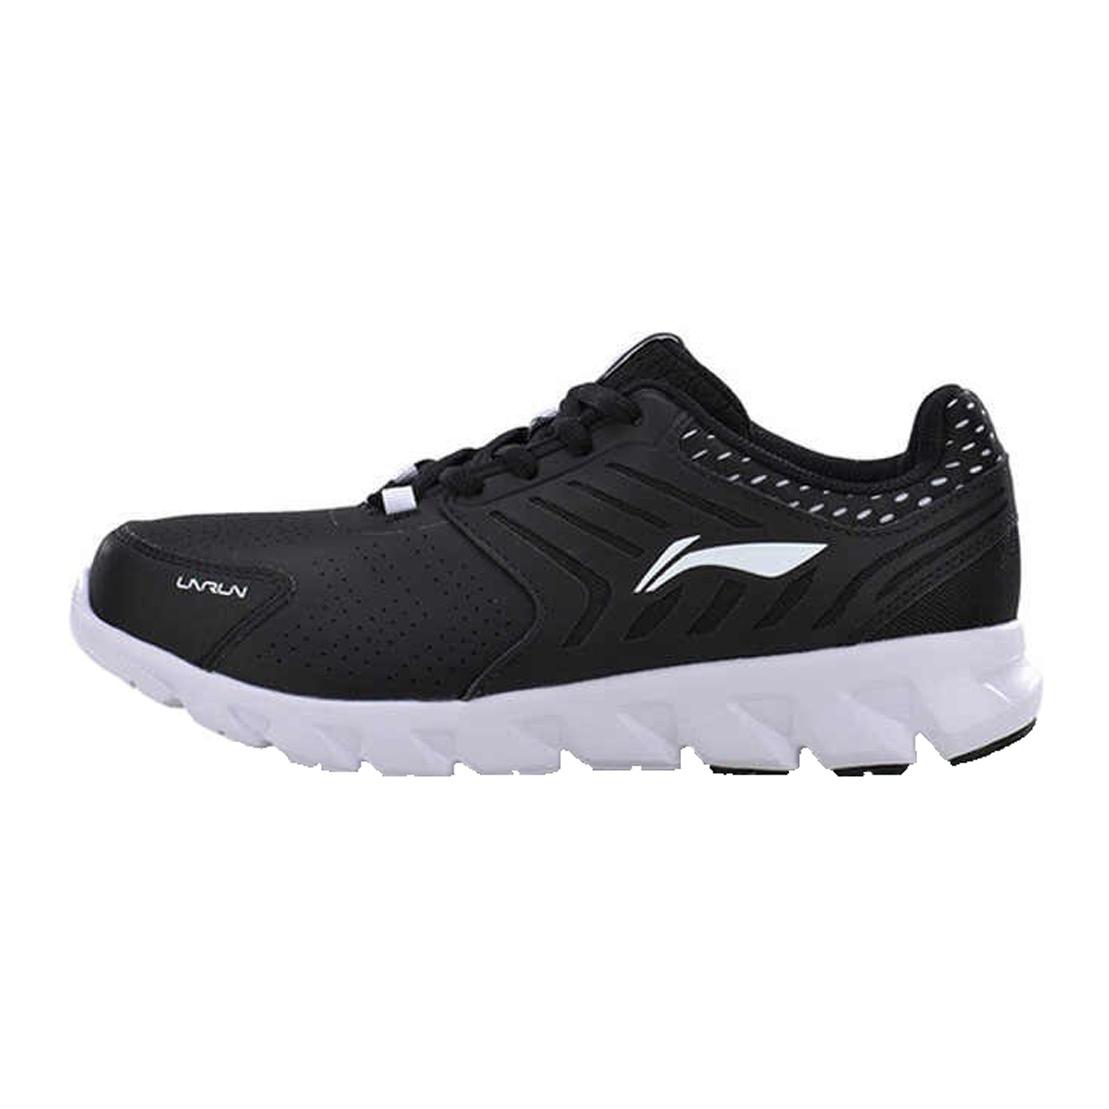 کفش مخصوص دویدن زنانه لینینگ کد ARHM028-2